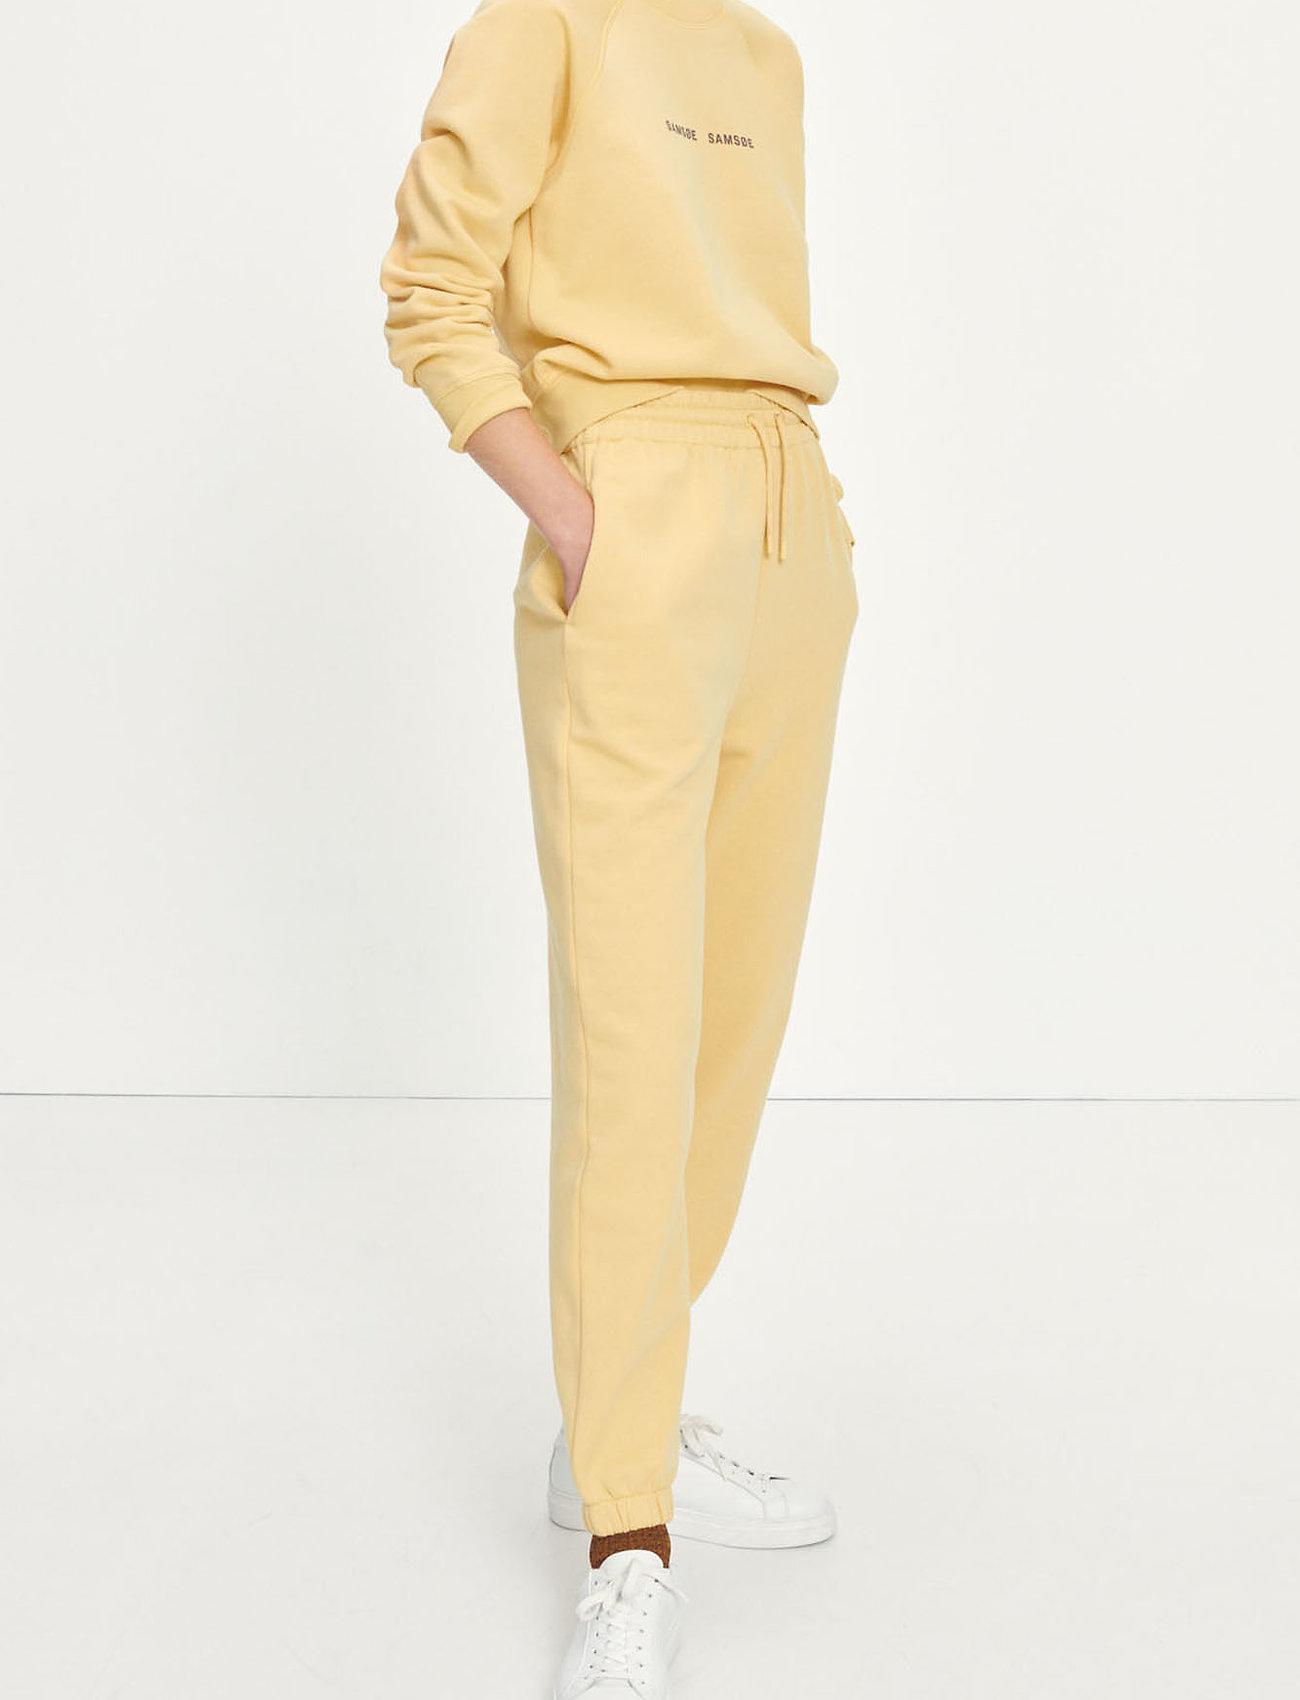 Samsøe Samsøe - Carmen trousers 10902 - sweatpants - sahara sun - 0